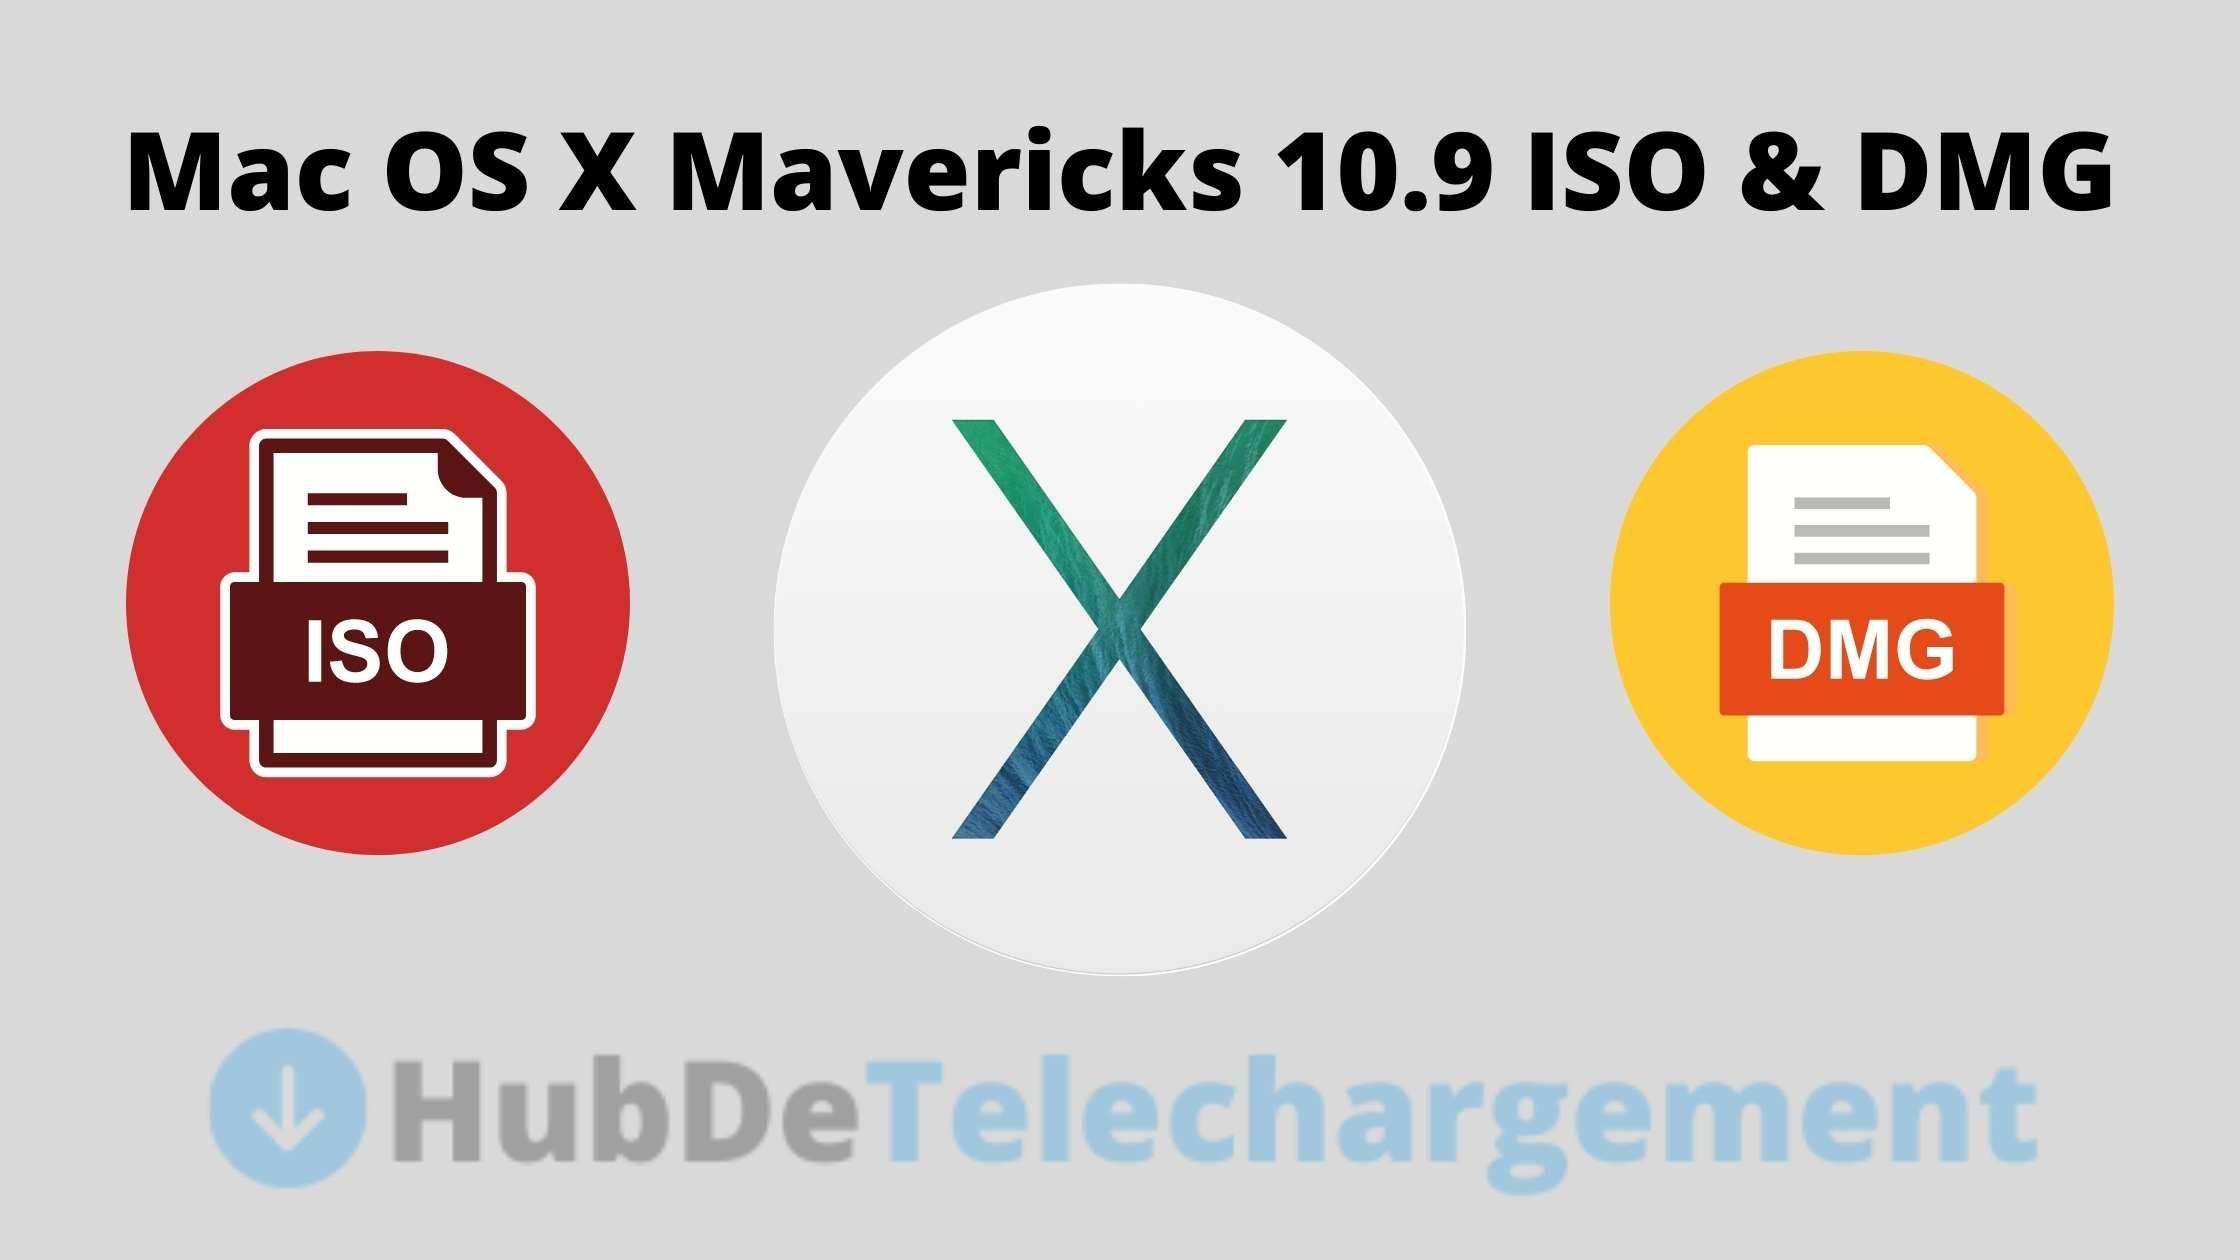 Mac OS X Mavericks 10.9